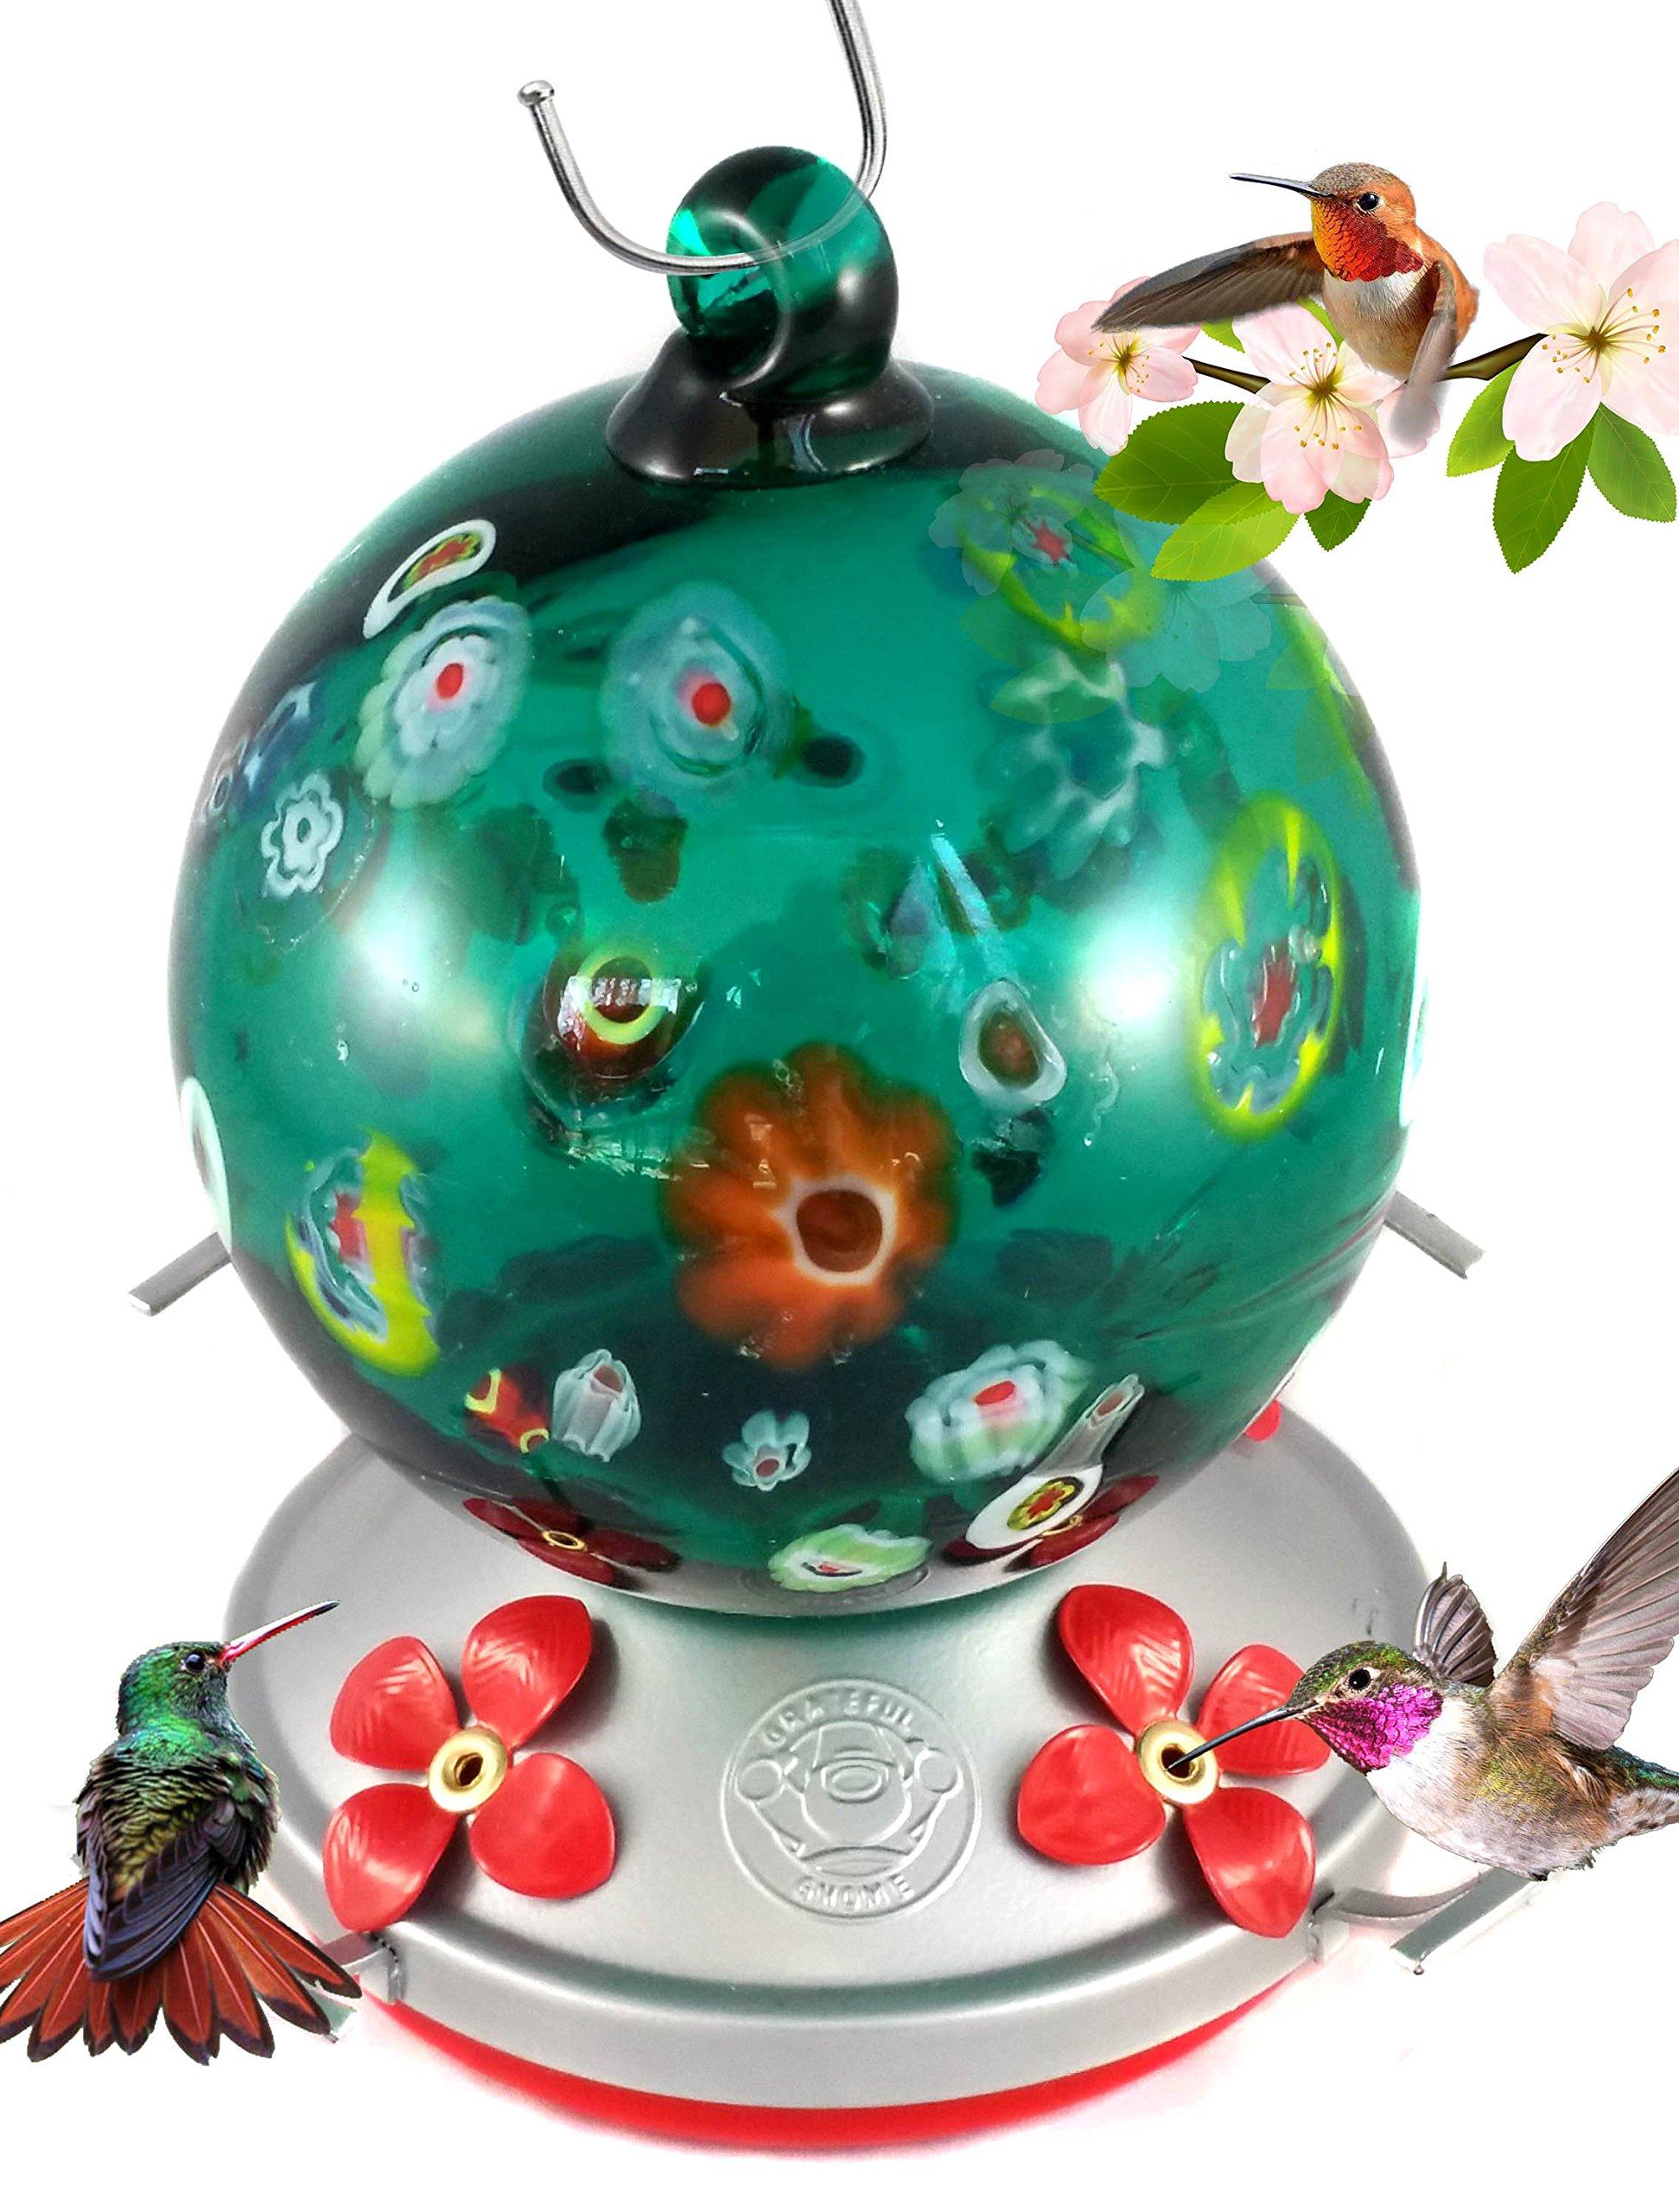 Grateful Gnome Hummingbird Feeder - Hand Blown Glass - Green Globe With Wild Flowers - 24 Fluid Ounces